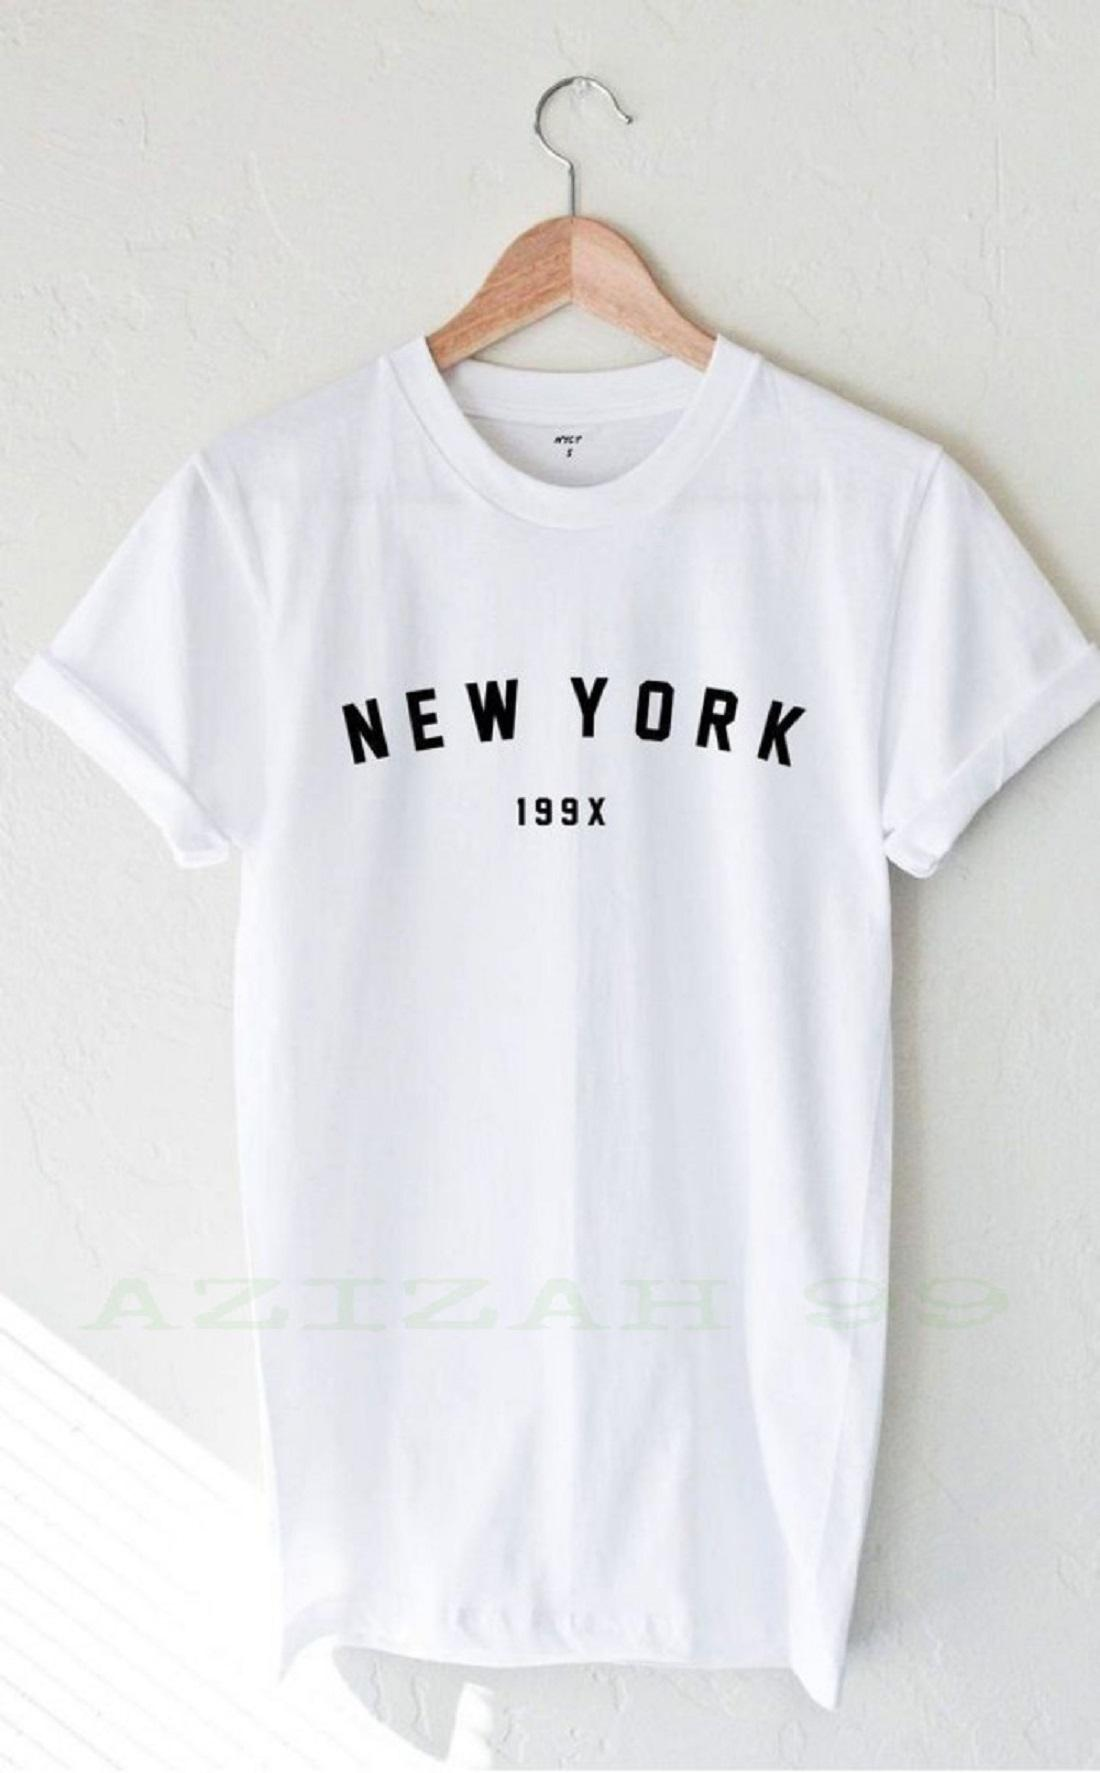 AZ99 - kaos distro T-shirt fashion 100% soft cotton combed 30s kaos pria